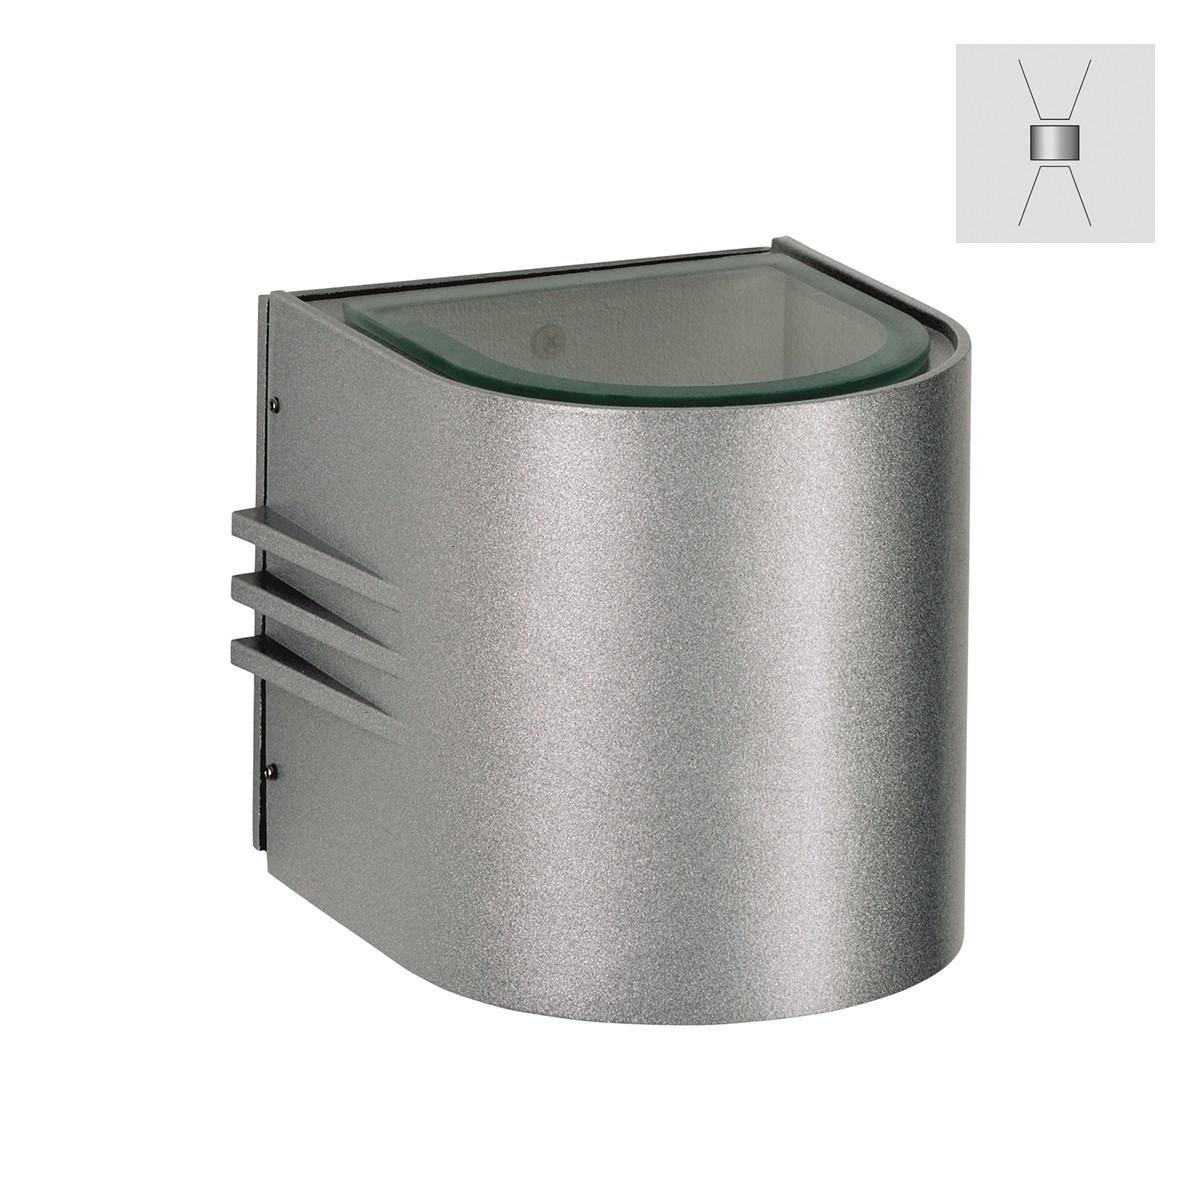 Albert 2308 Wandstrahler, breit/breit, Silber